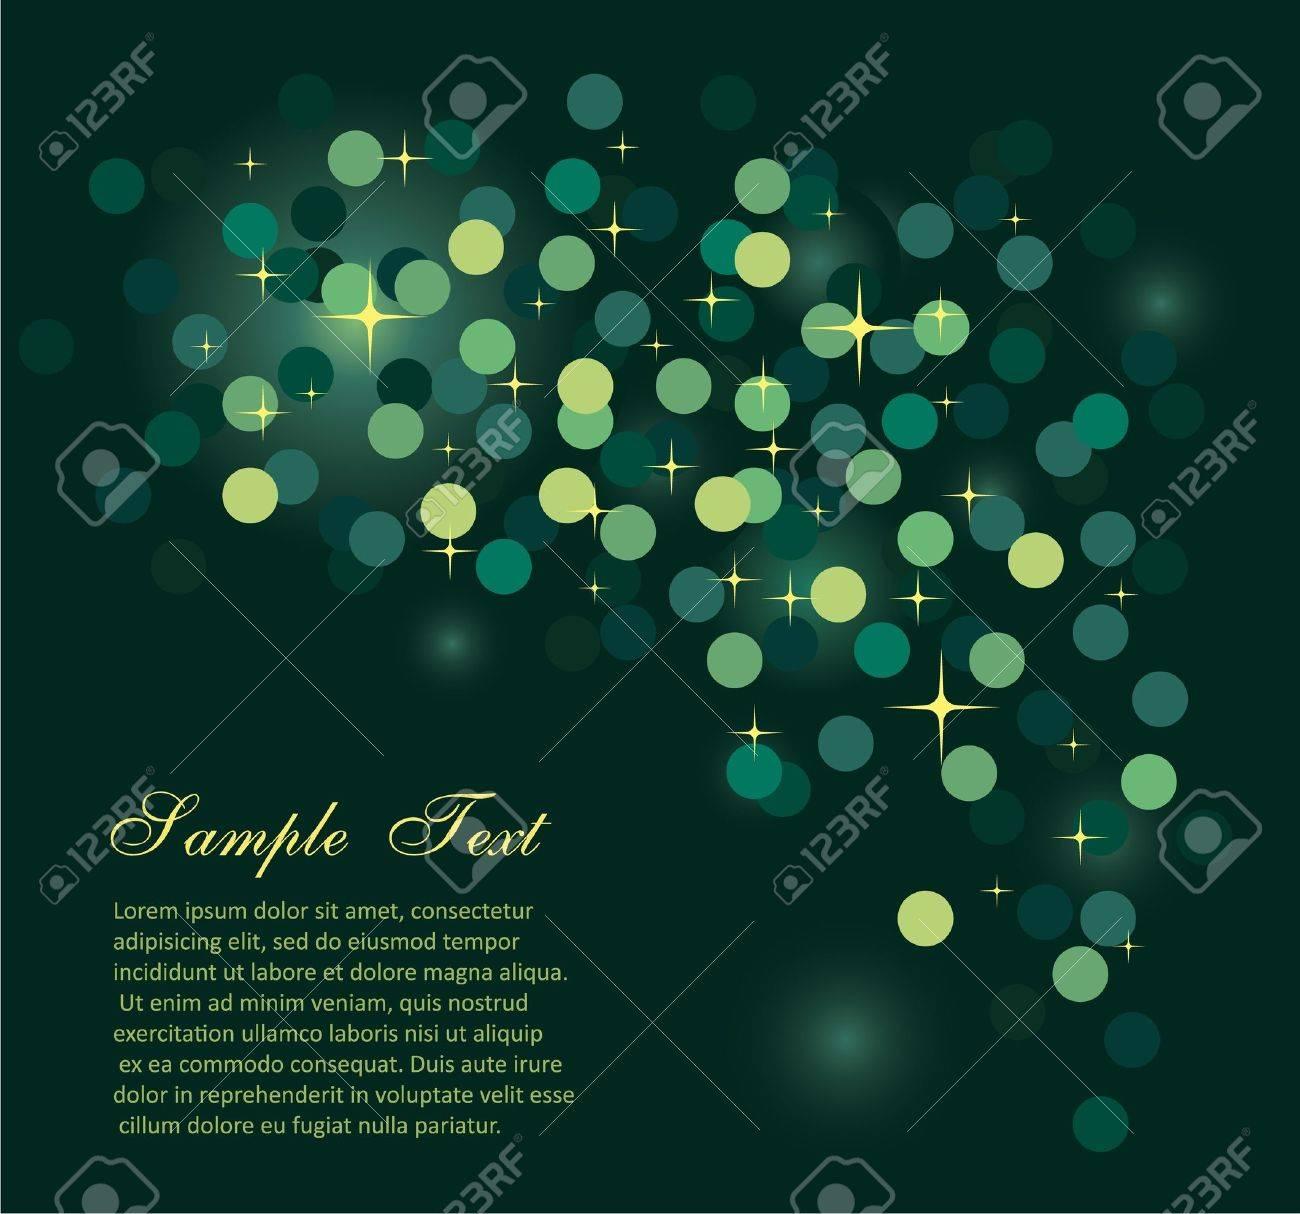 Elegant Colorful Glitter Abstrat Lights for Flyers Background Stock Vector - 7719561